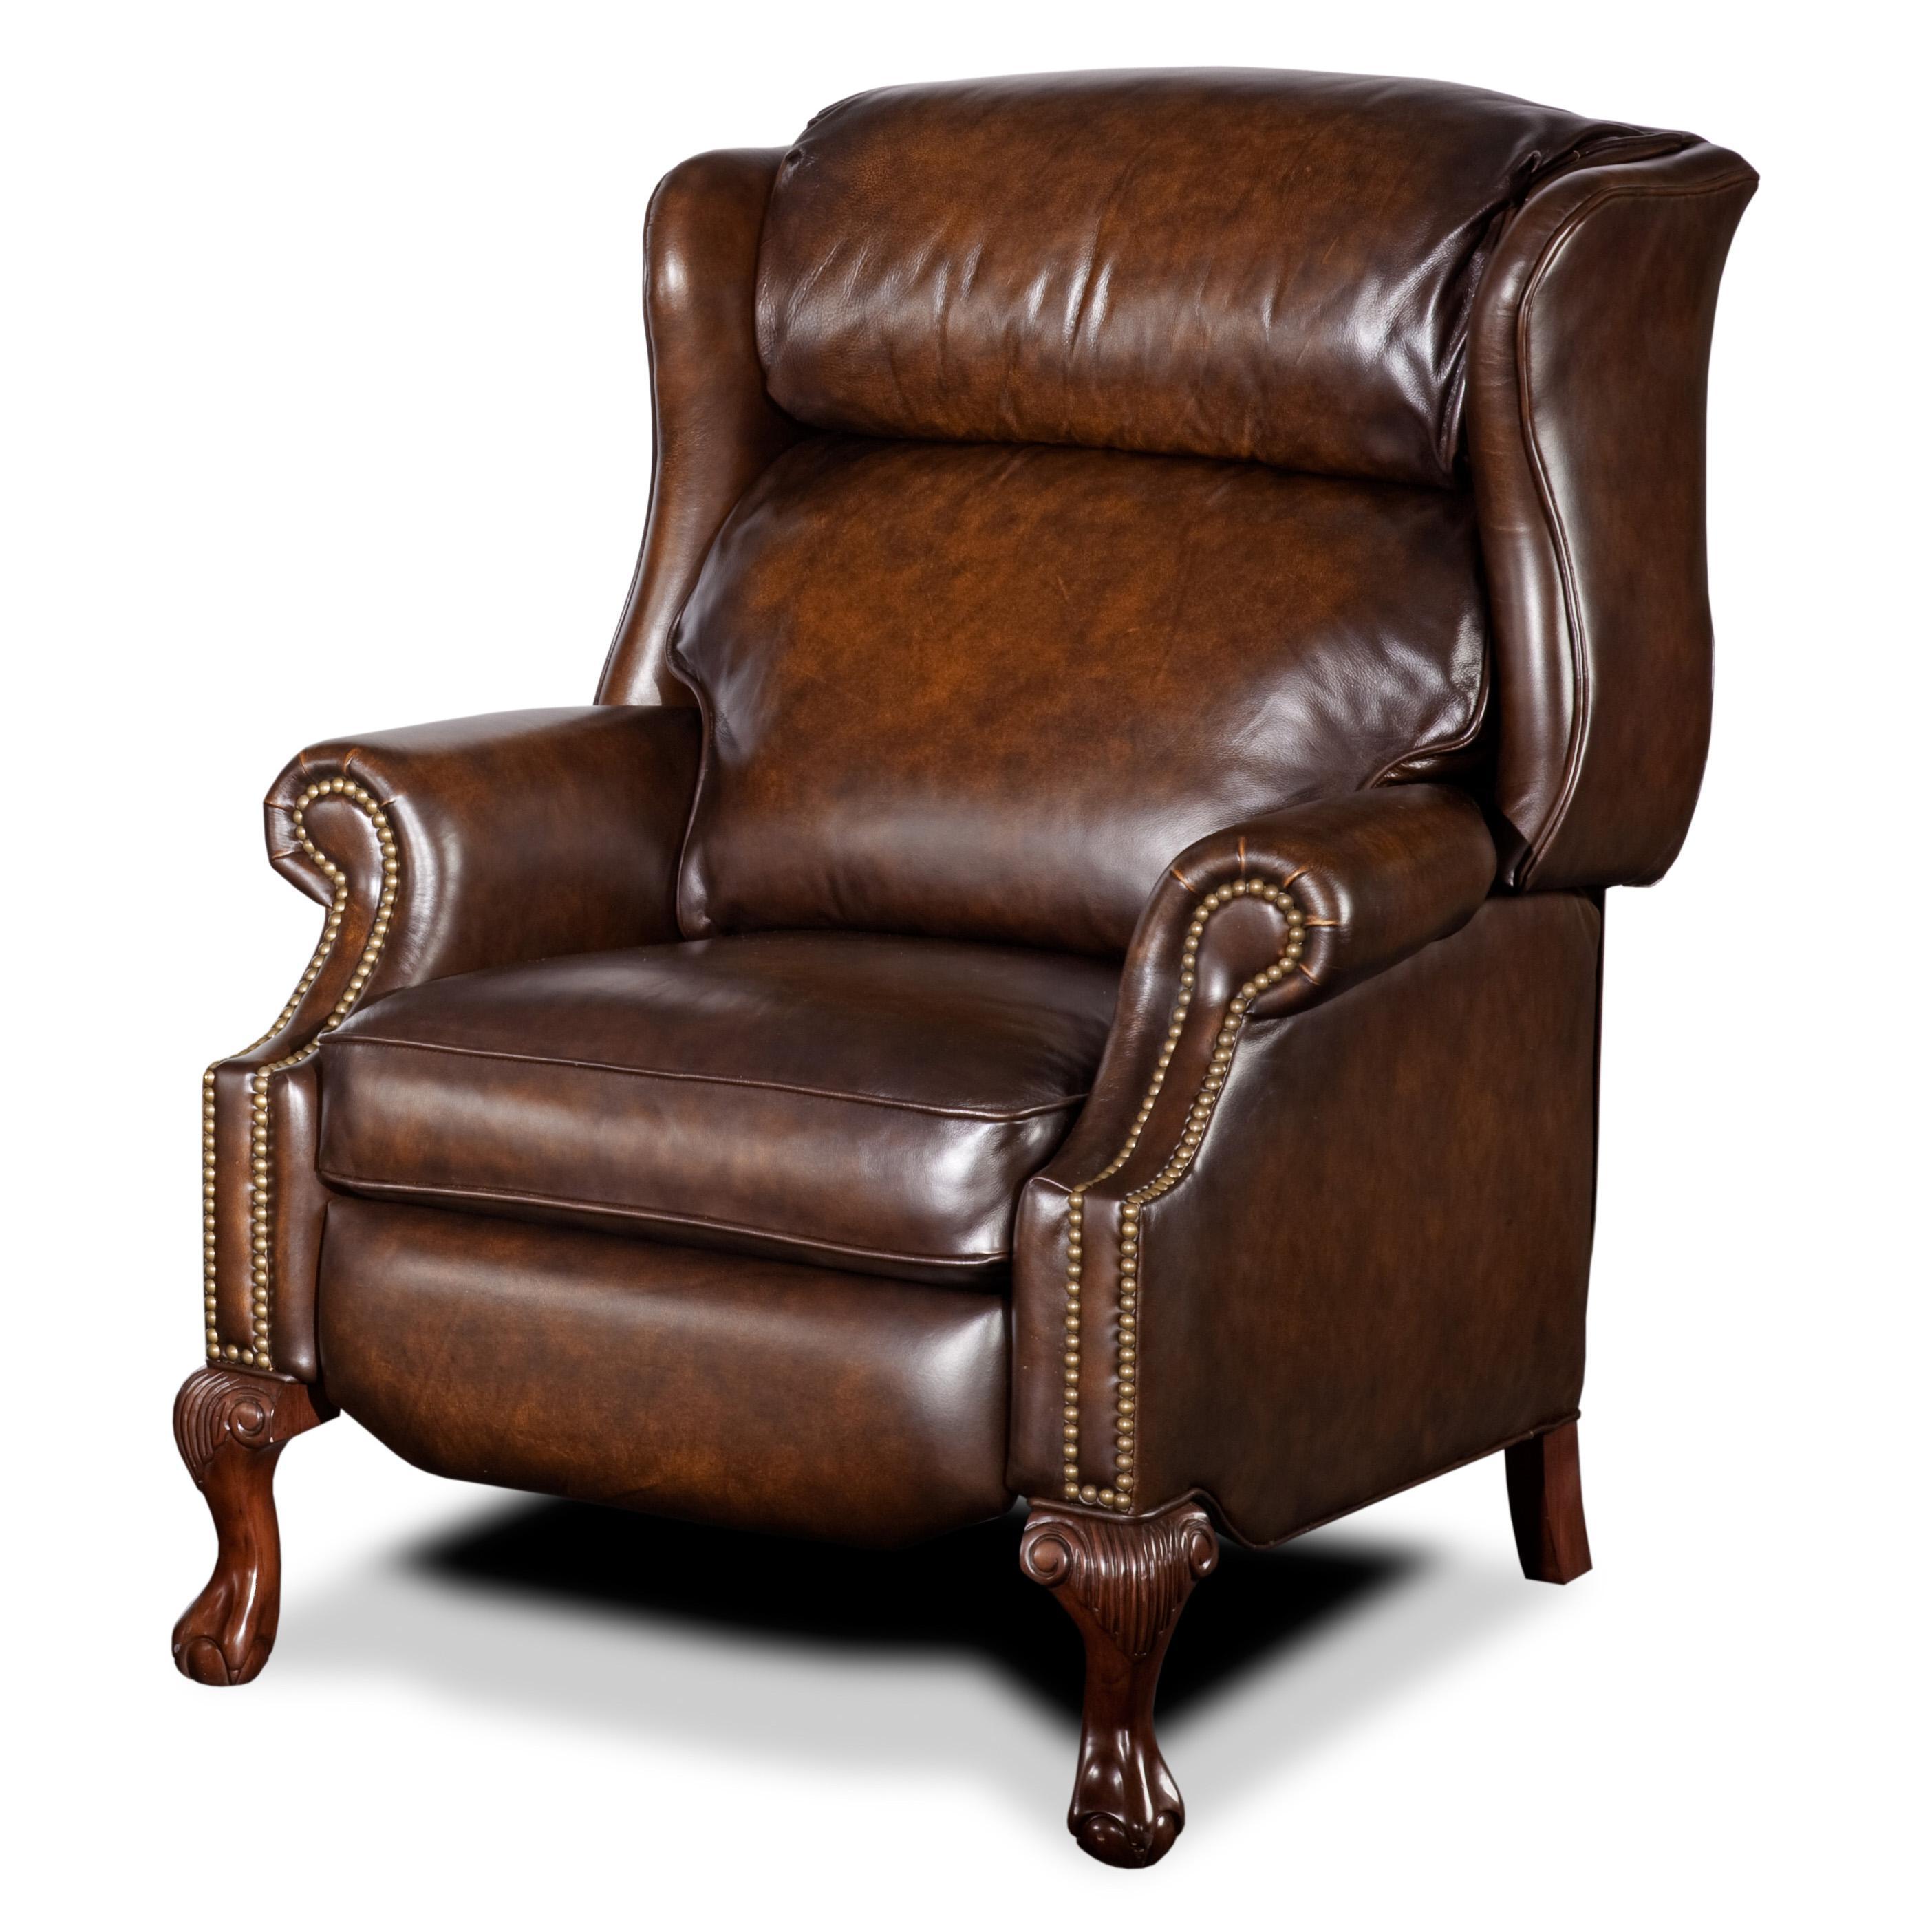 Hooker furniture reclining chairs high leg wing recliner for Recliner chair